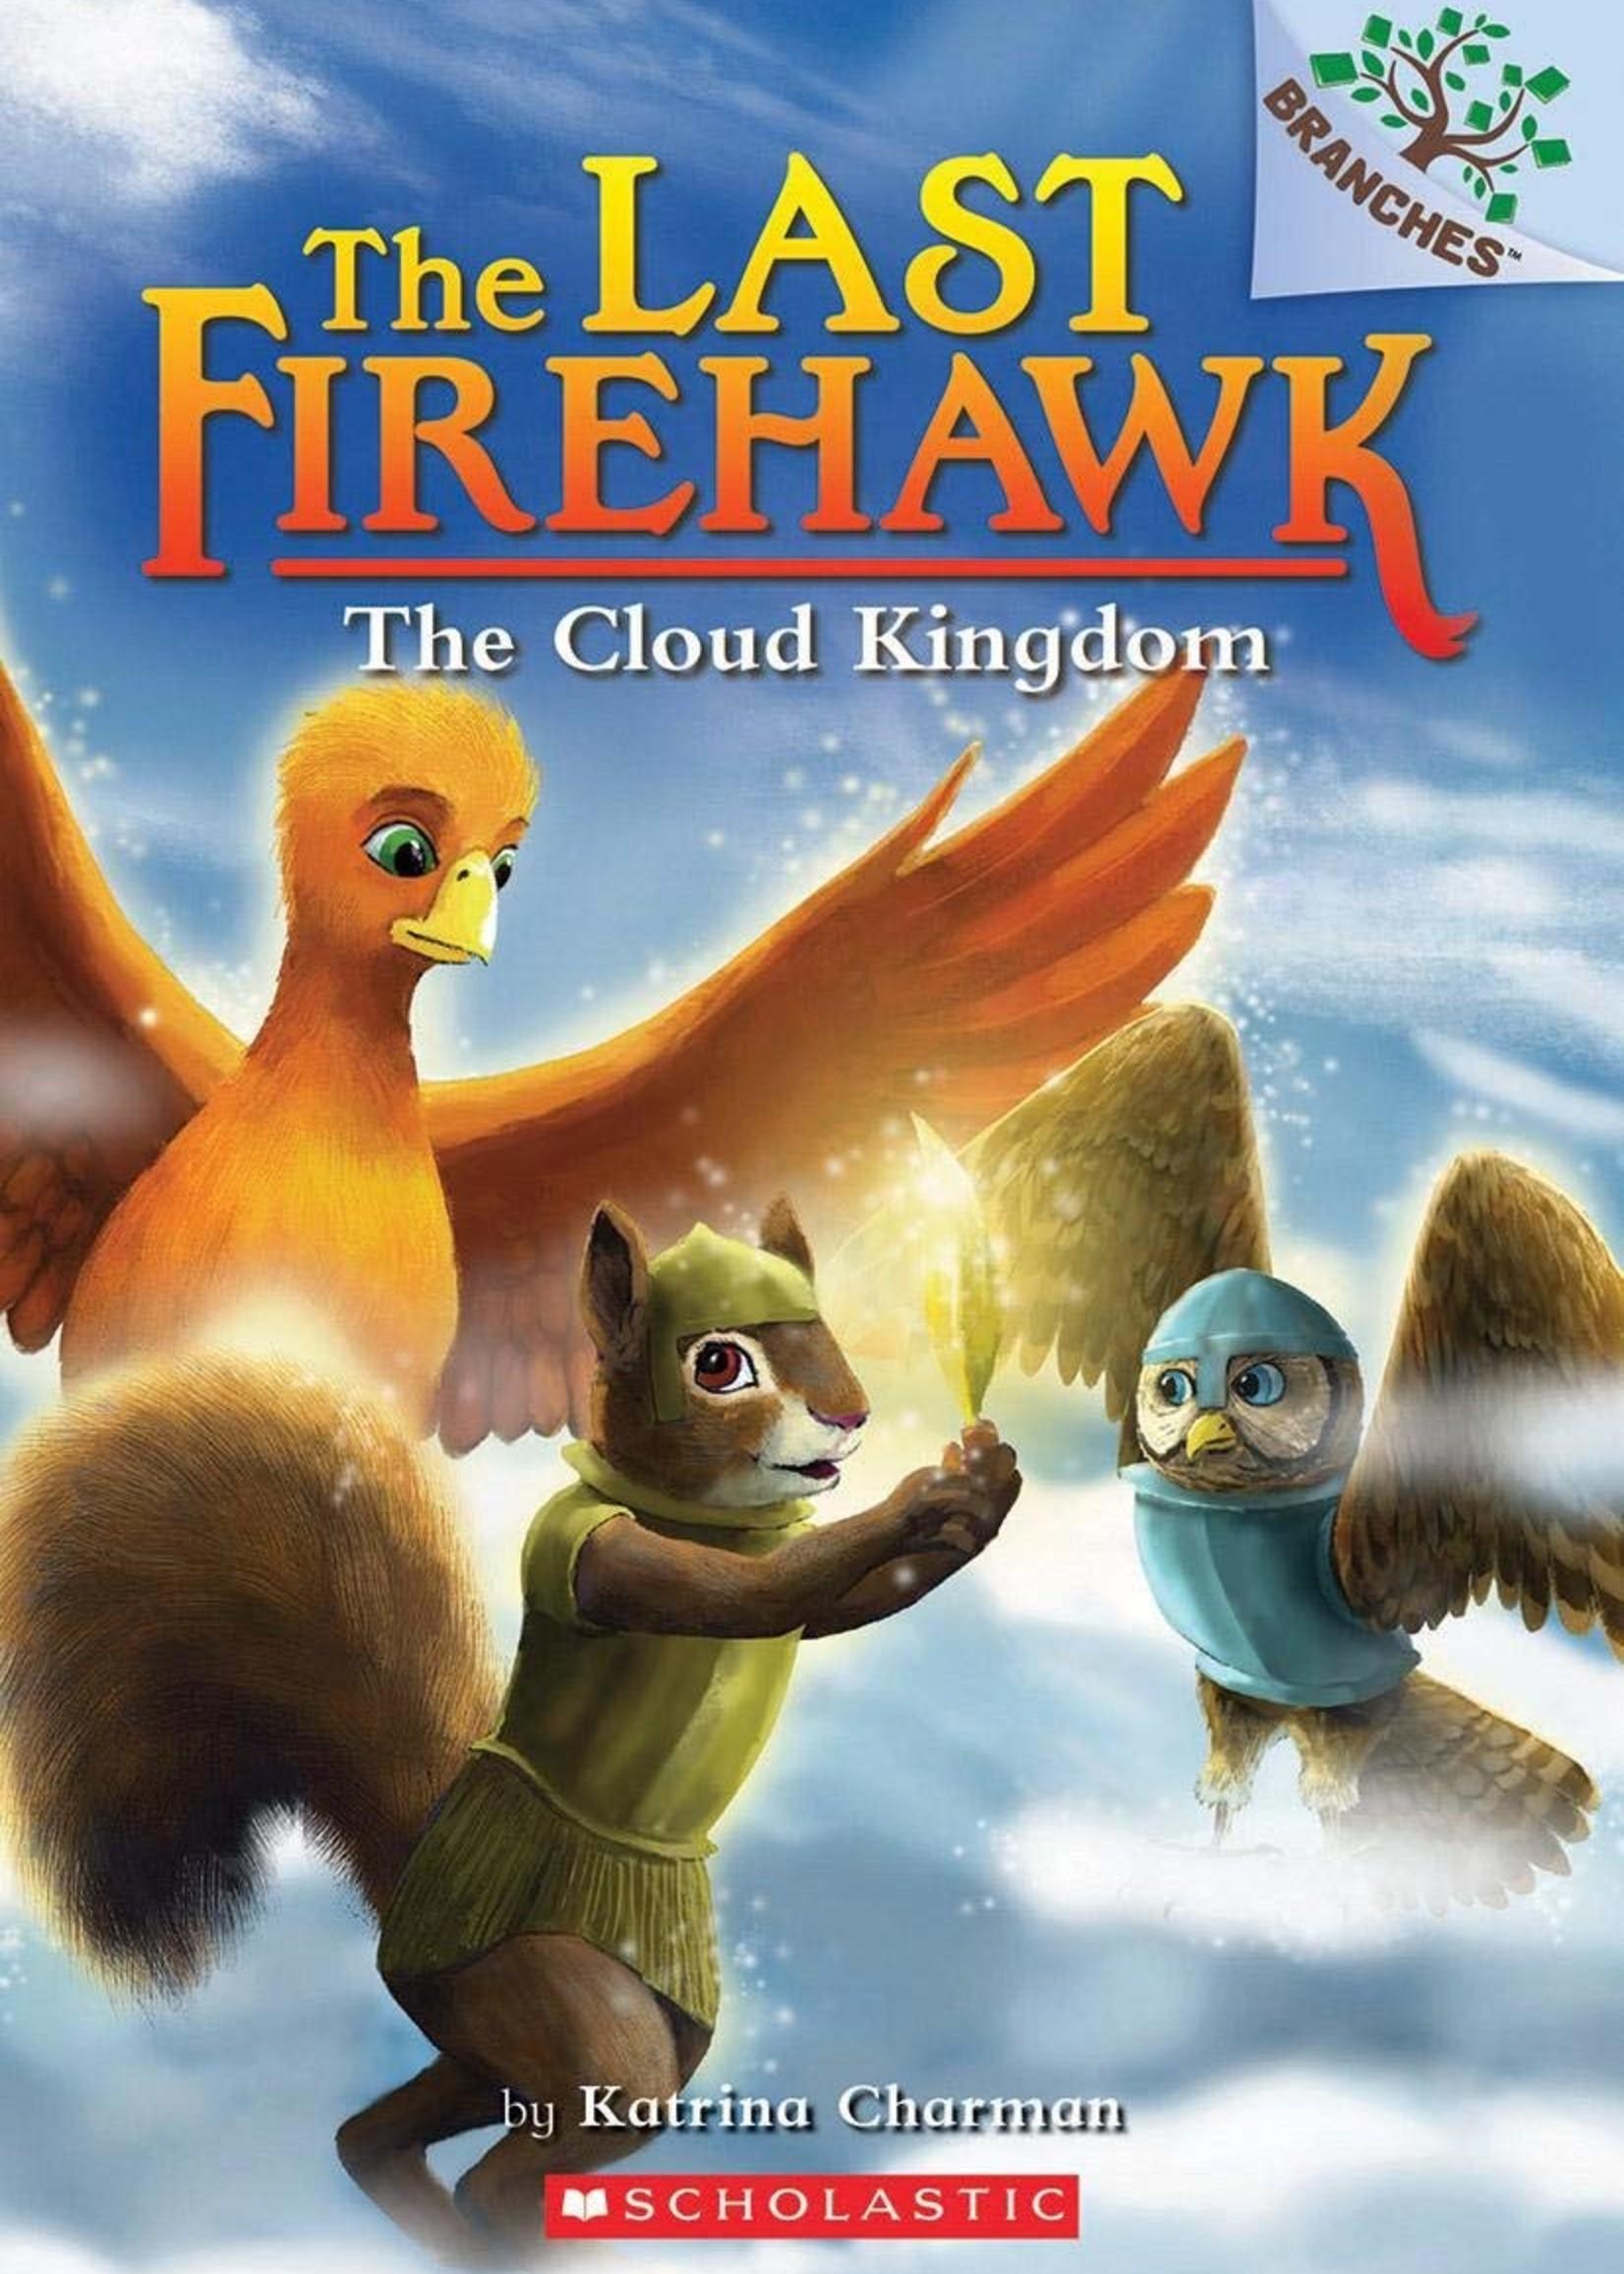 The Last Firehawk #07, The Cloud Kingdom - Paperback